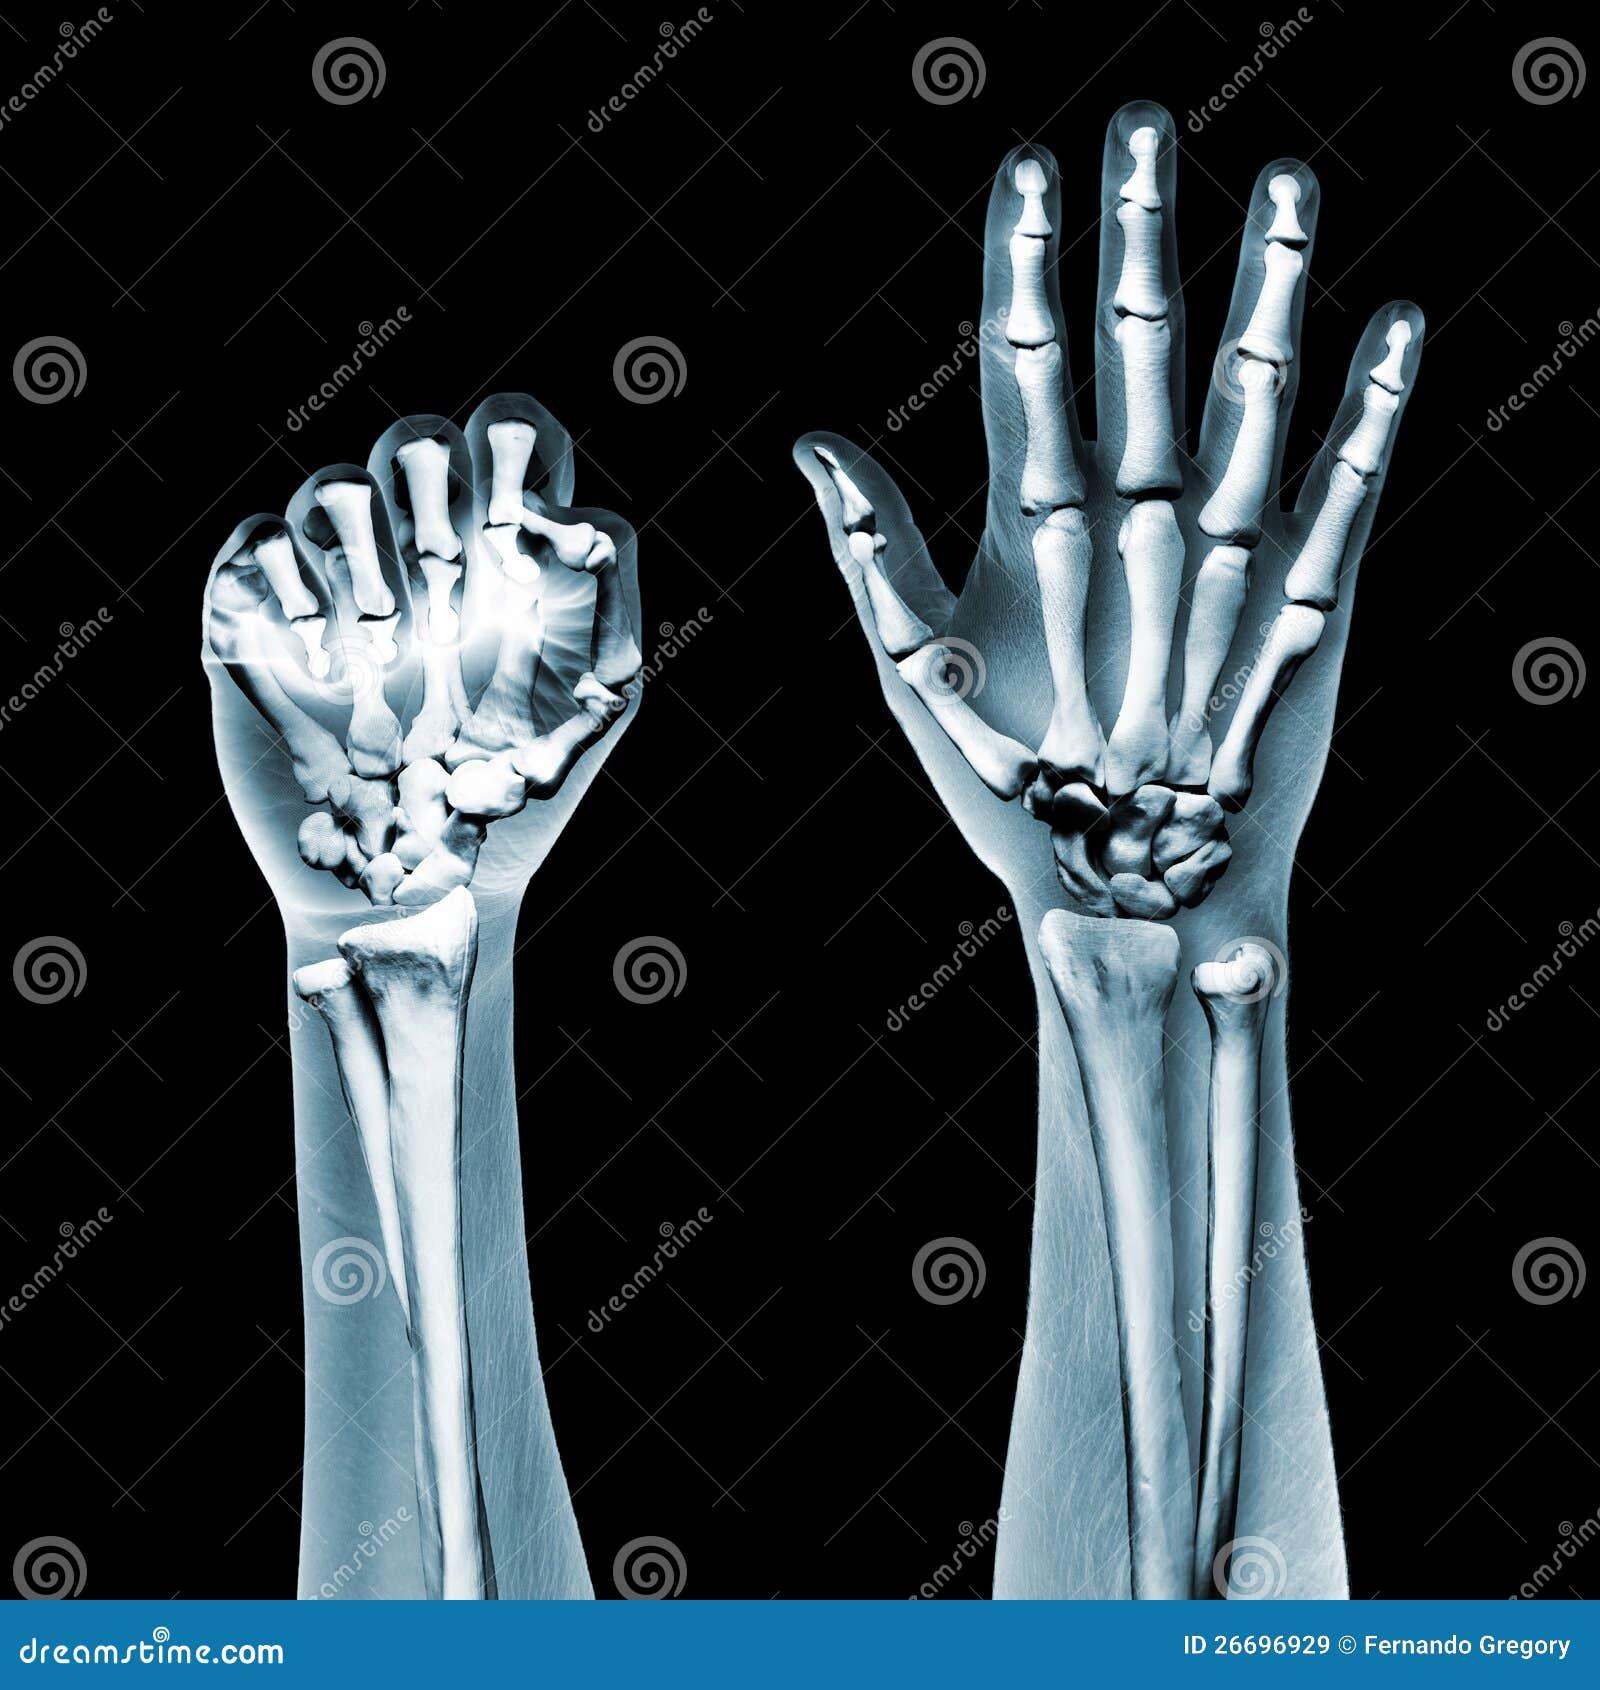 dramatized x ray of a hand on black royaltyfree stock